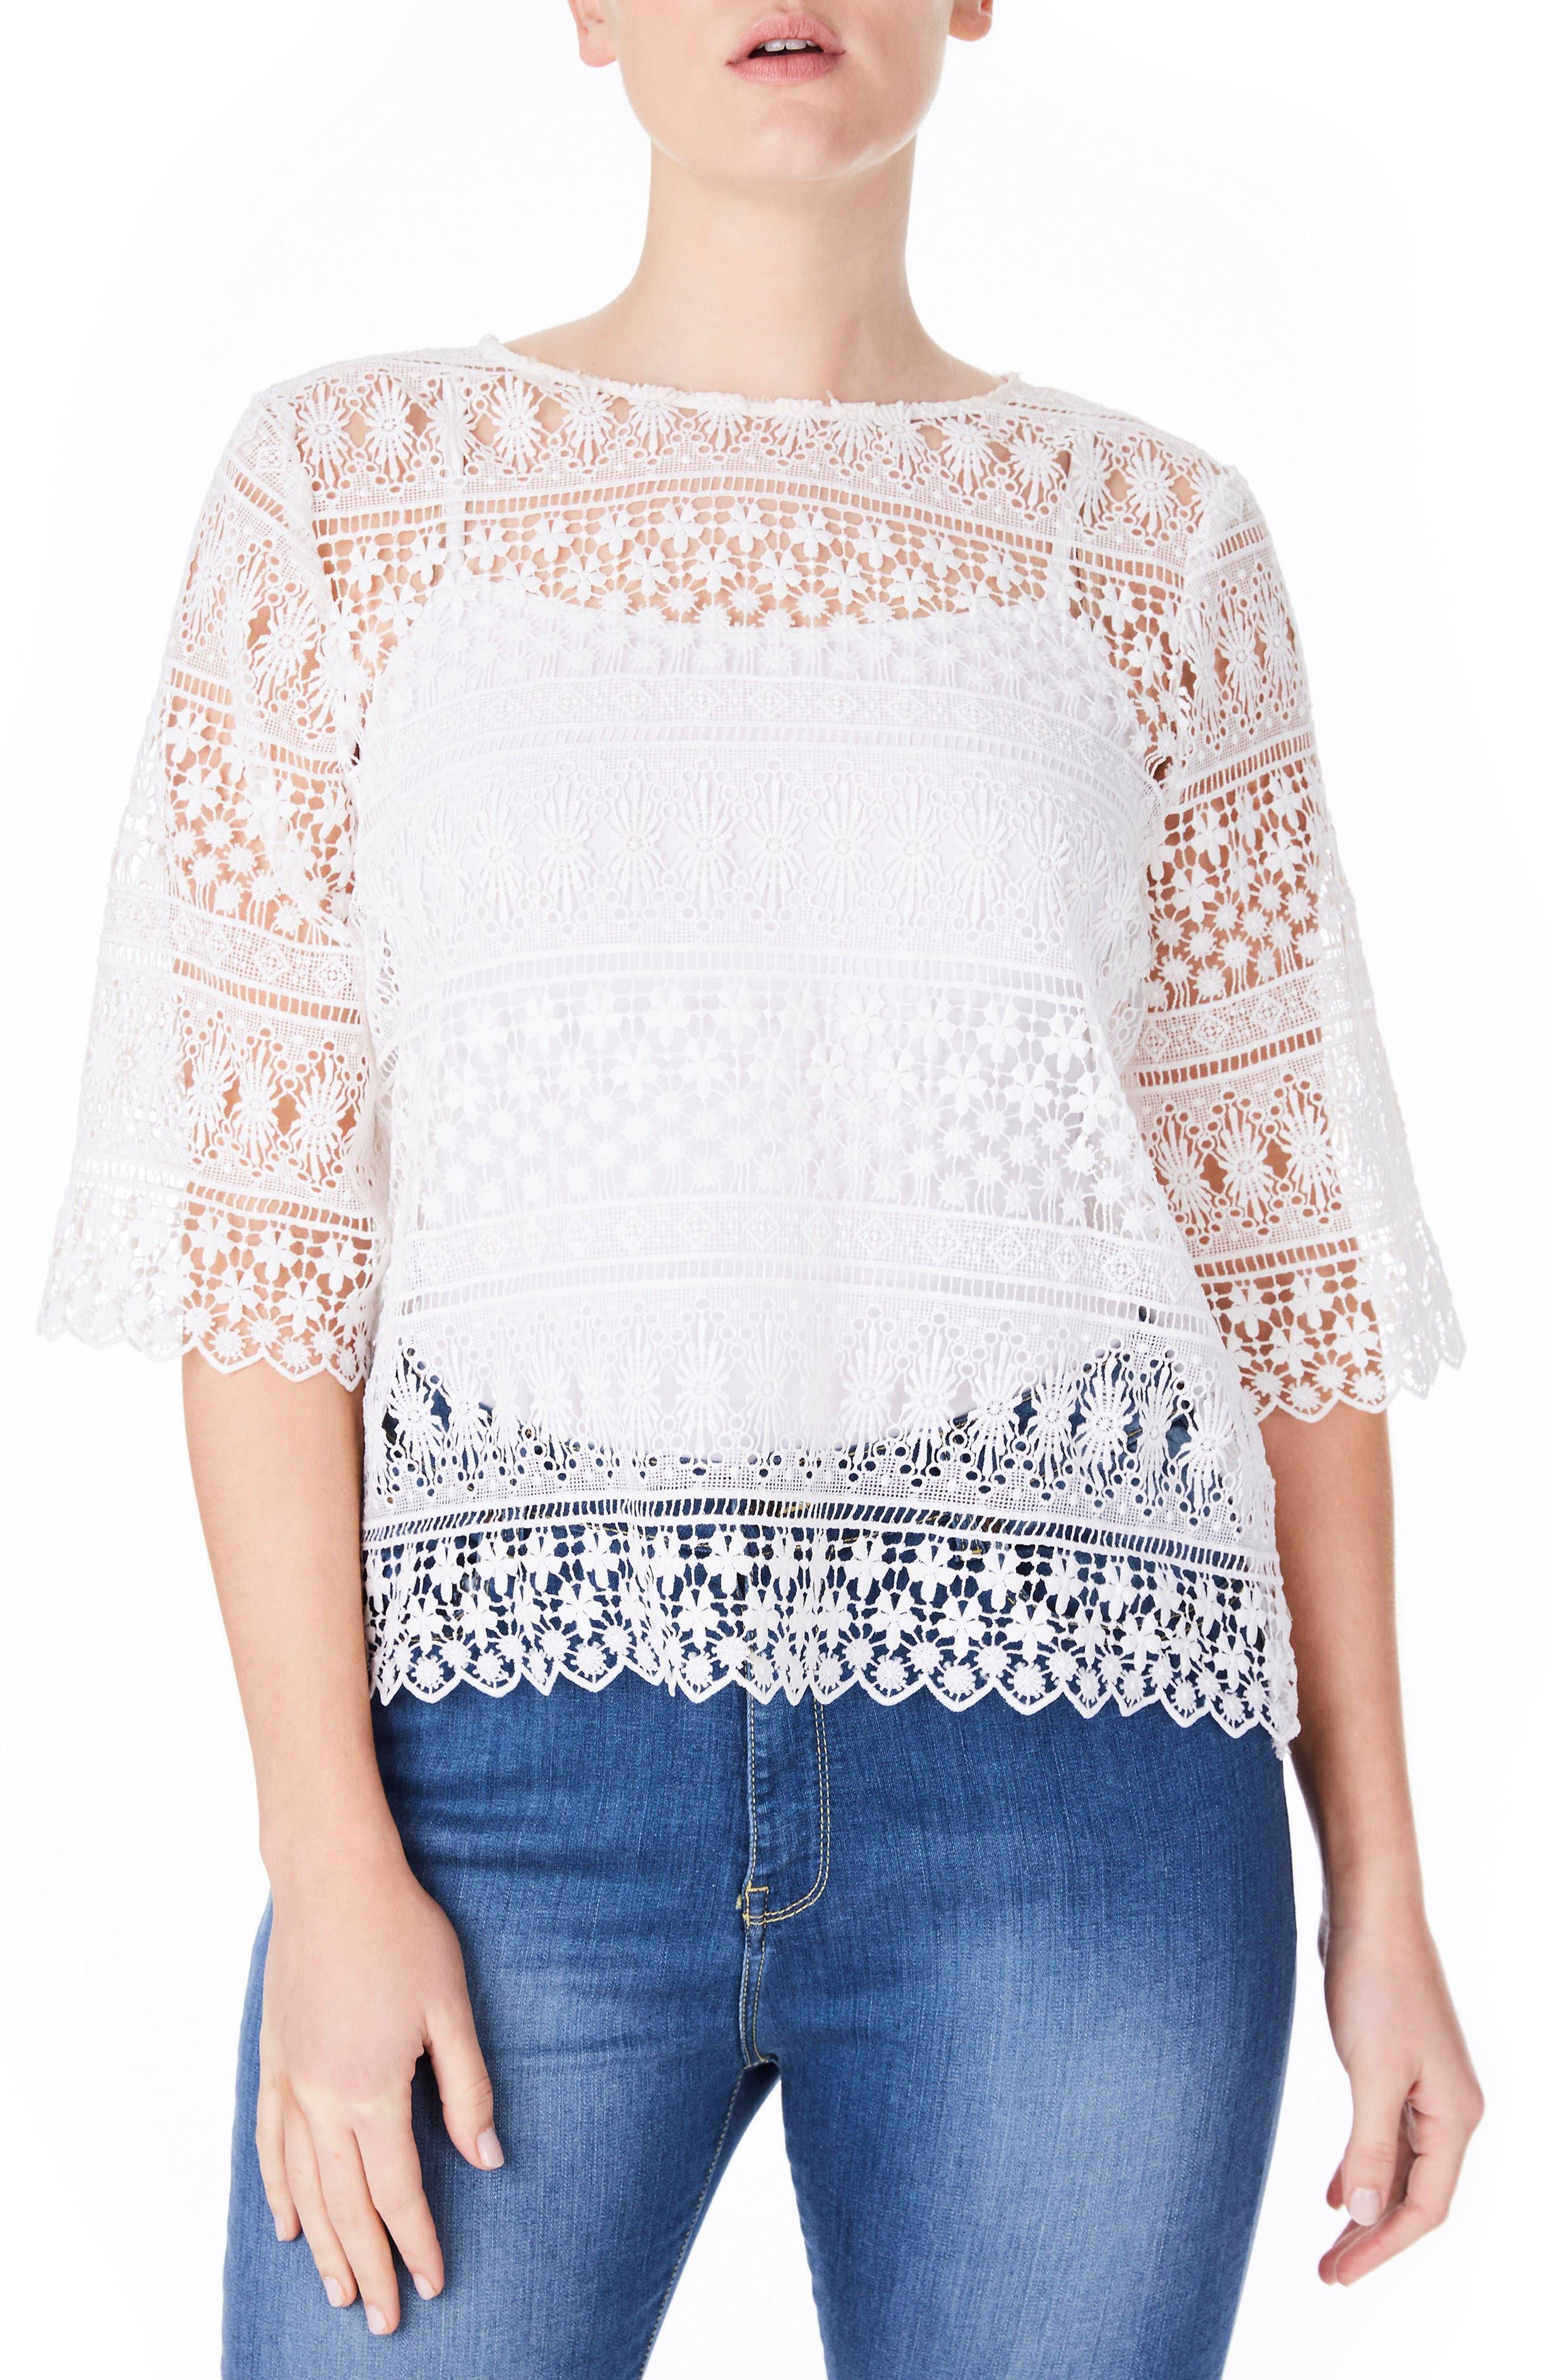 Main Image - ELVI White Lace Top (Plus Size)